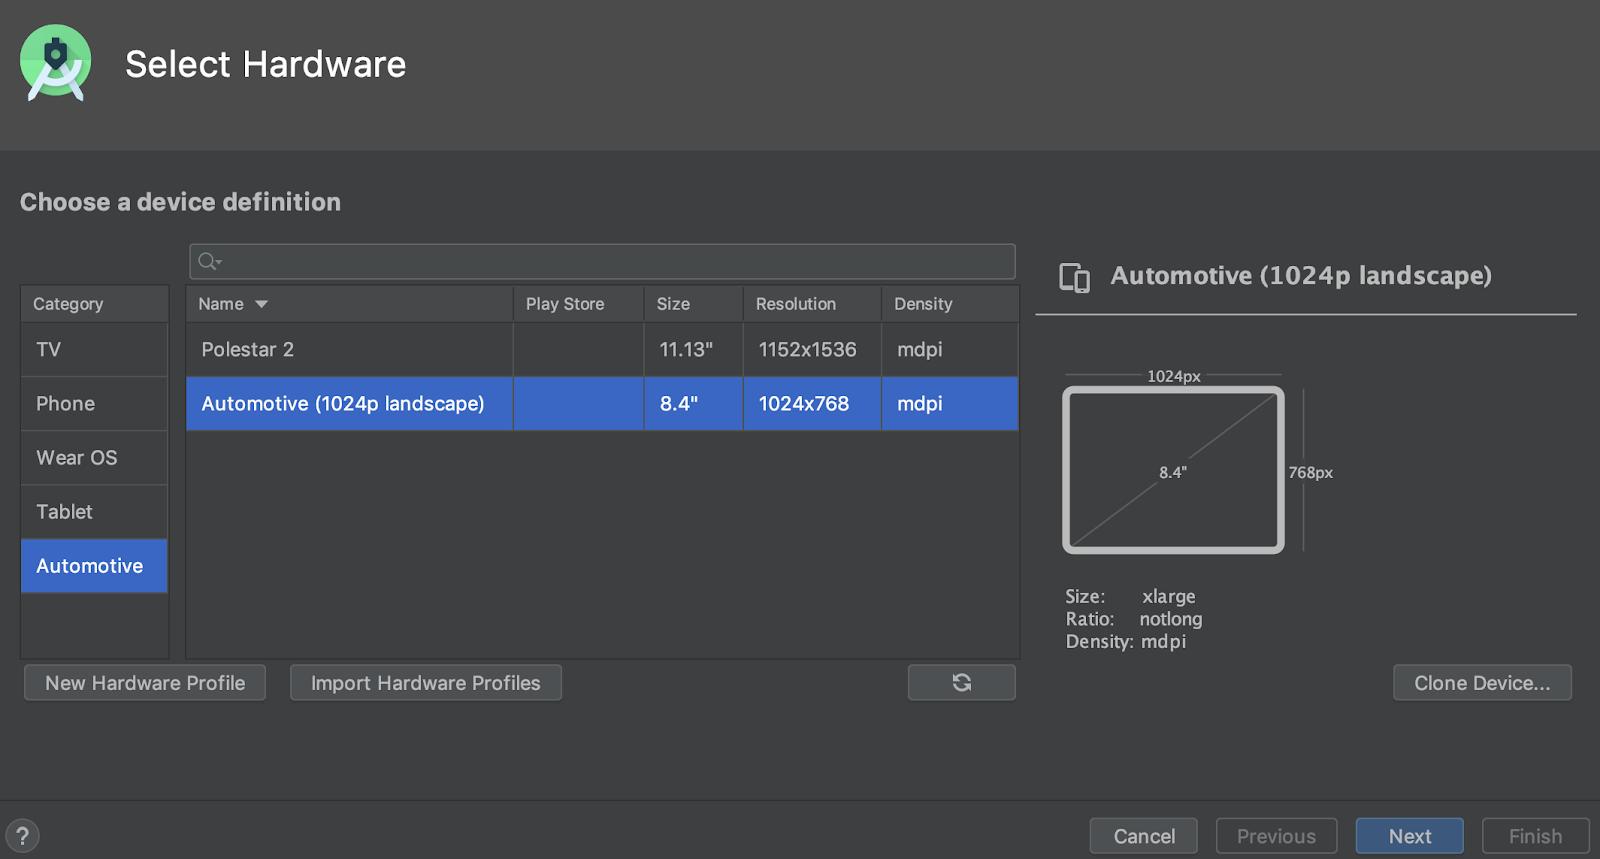 选择 Android Automotive 虚拟设备。